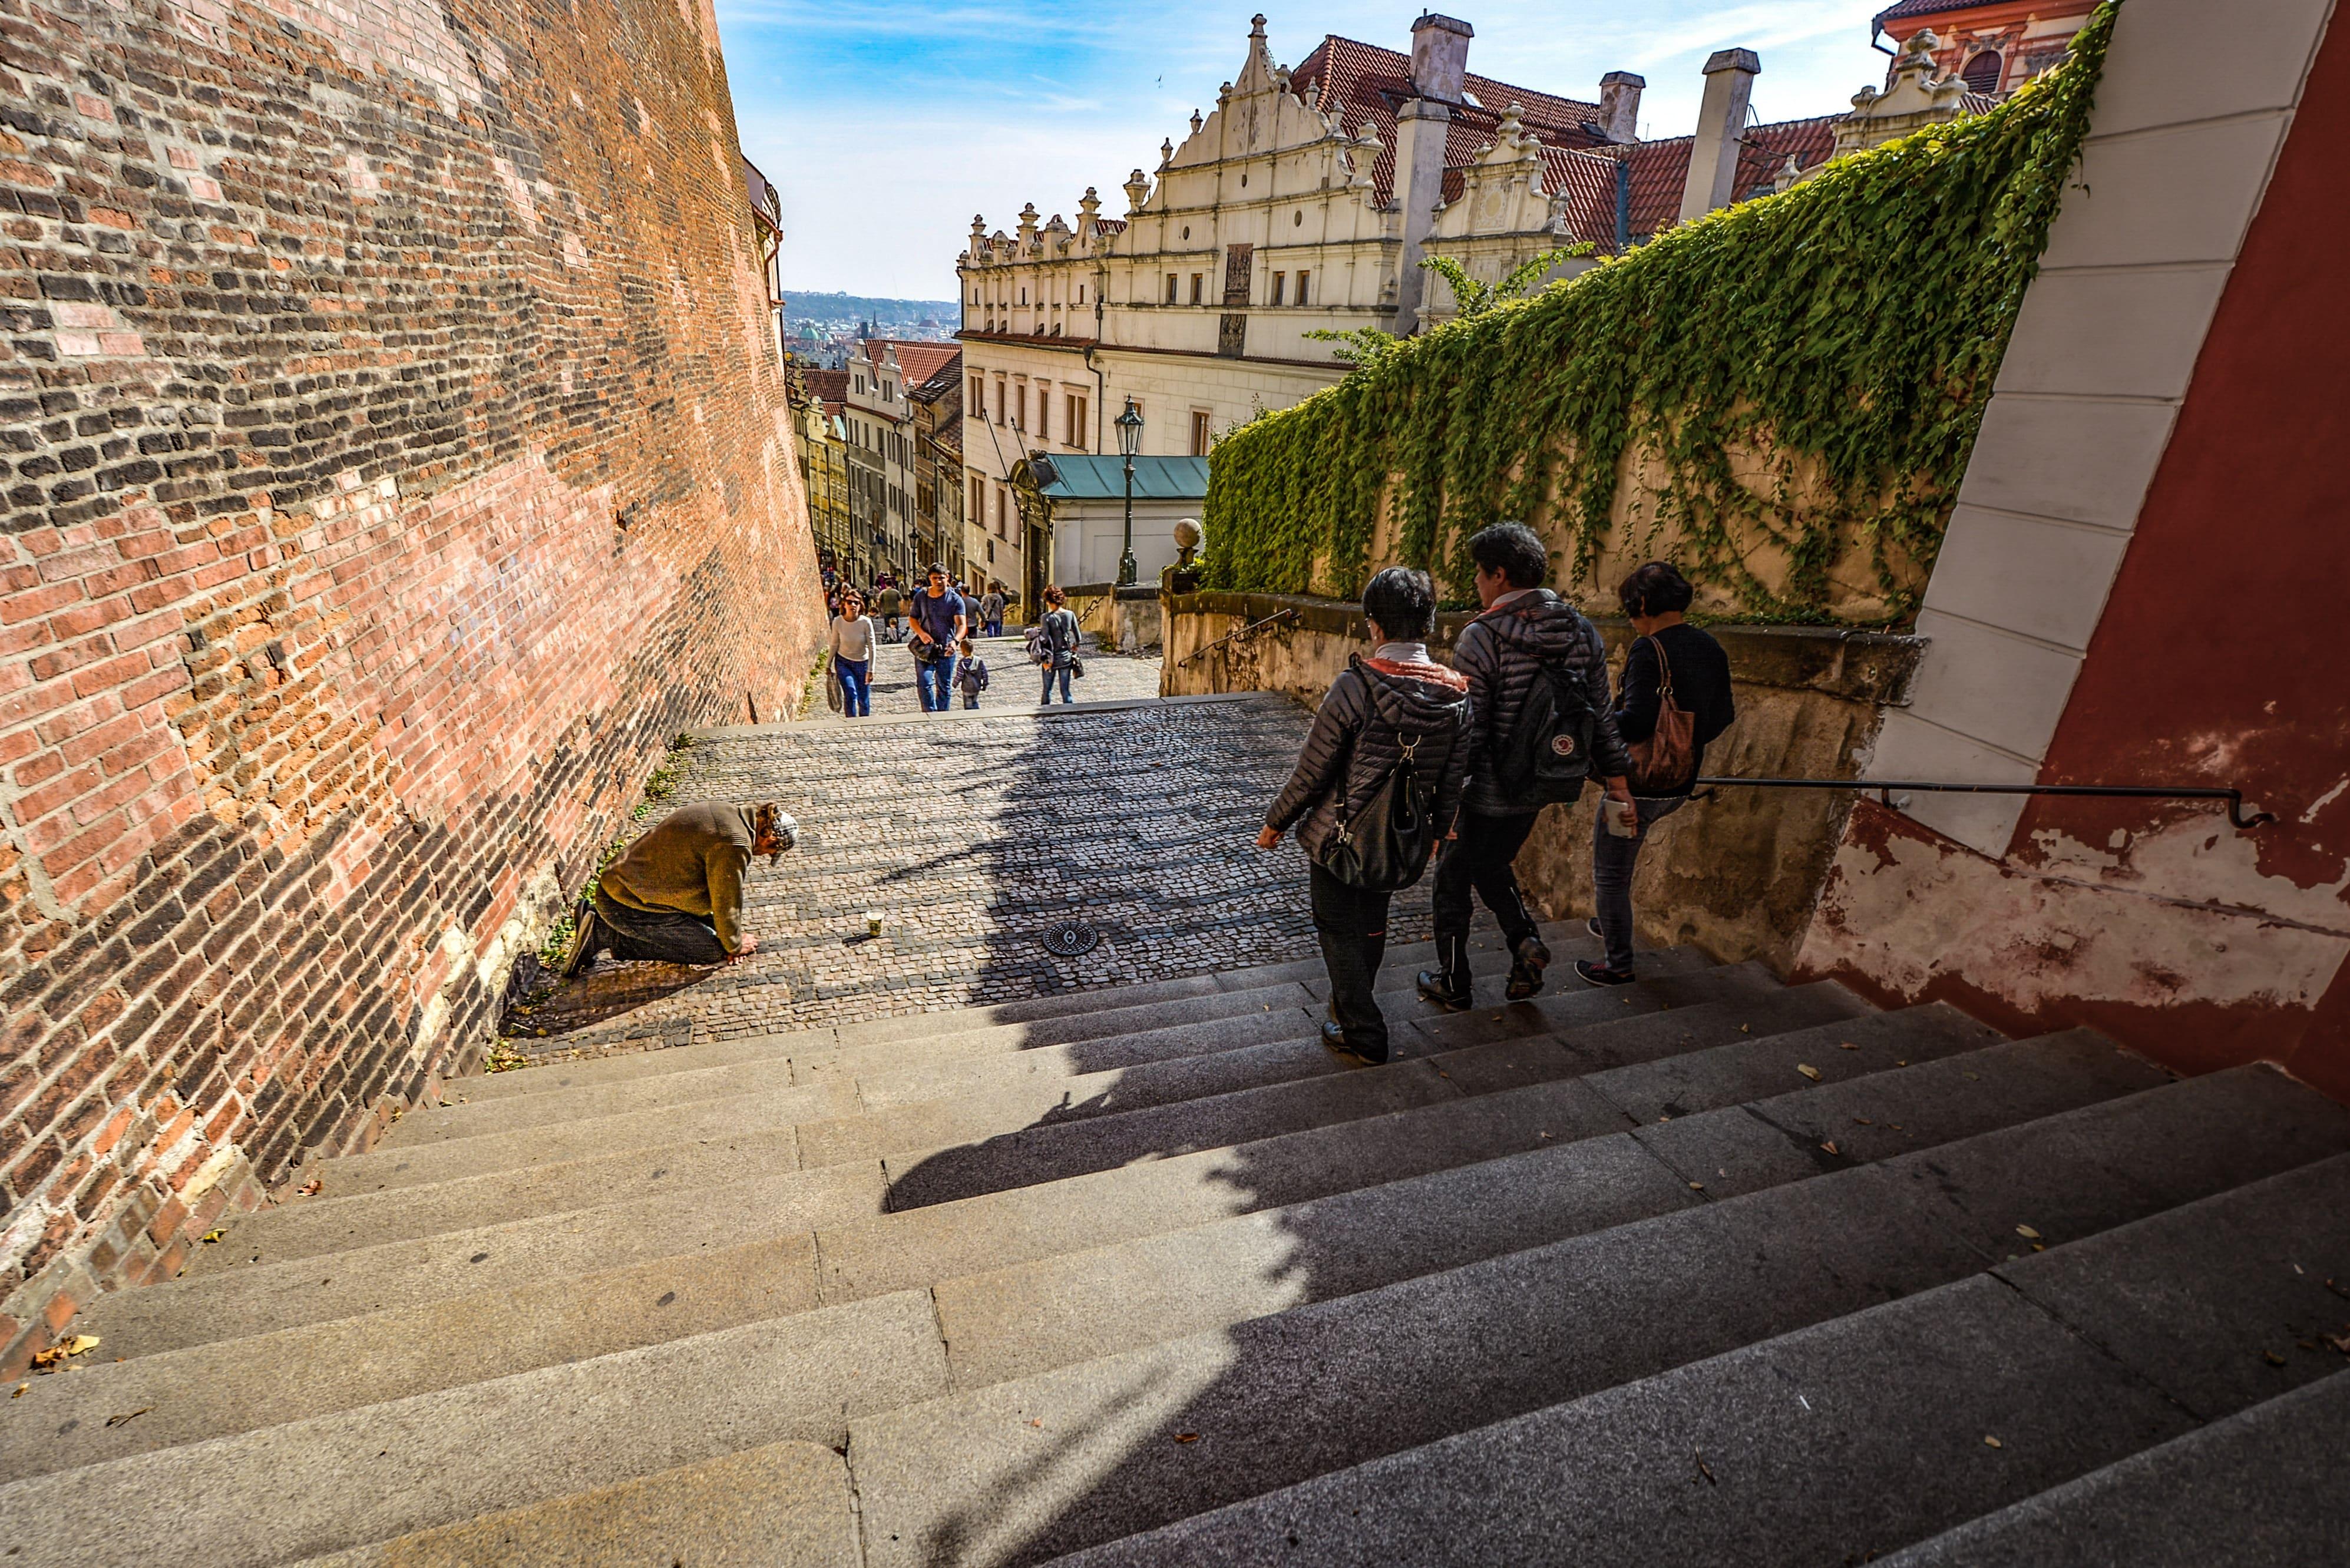 Destinos turismo de pobreza